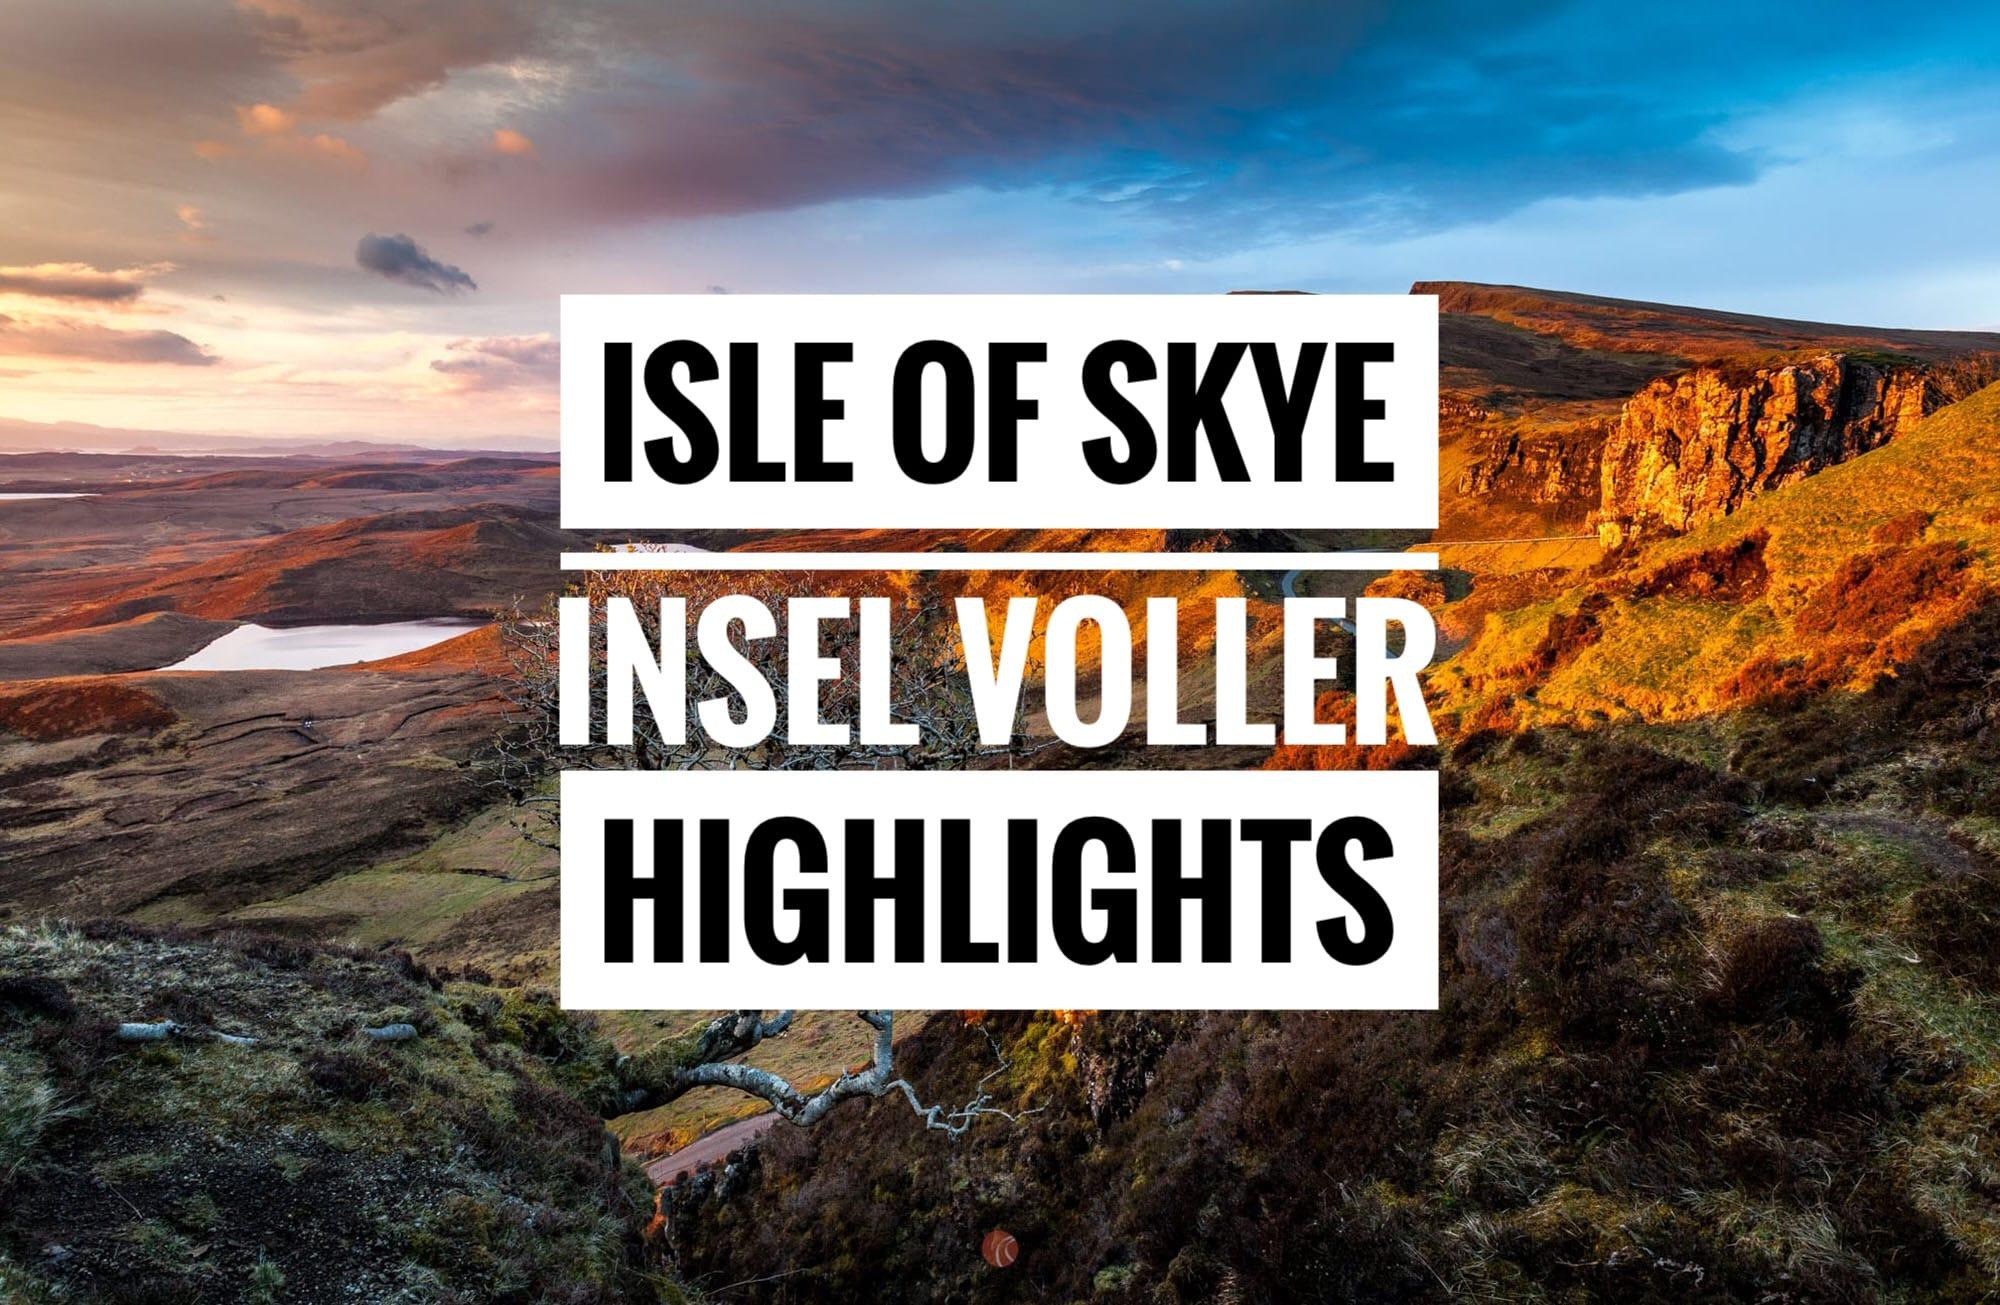 Isle of Skye – Insel voller Highlights